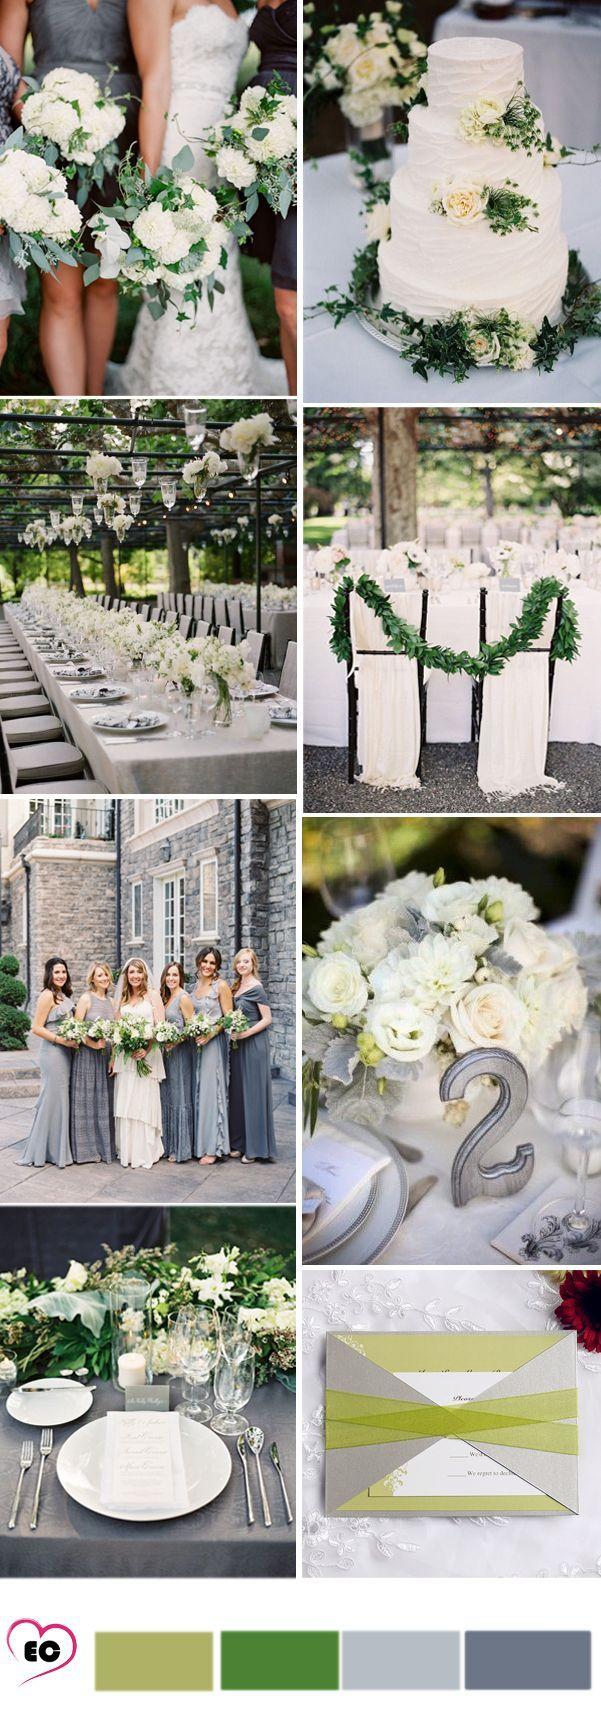 grey and green wedding idea